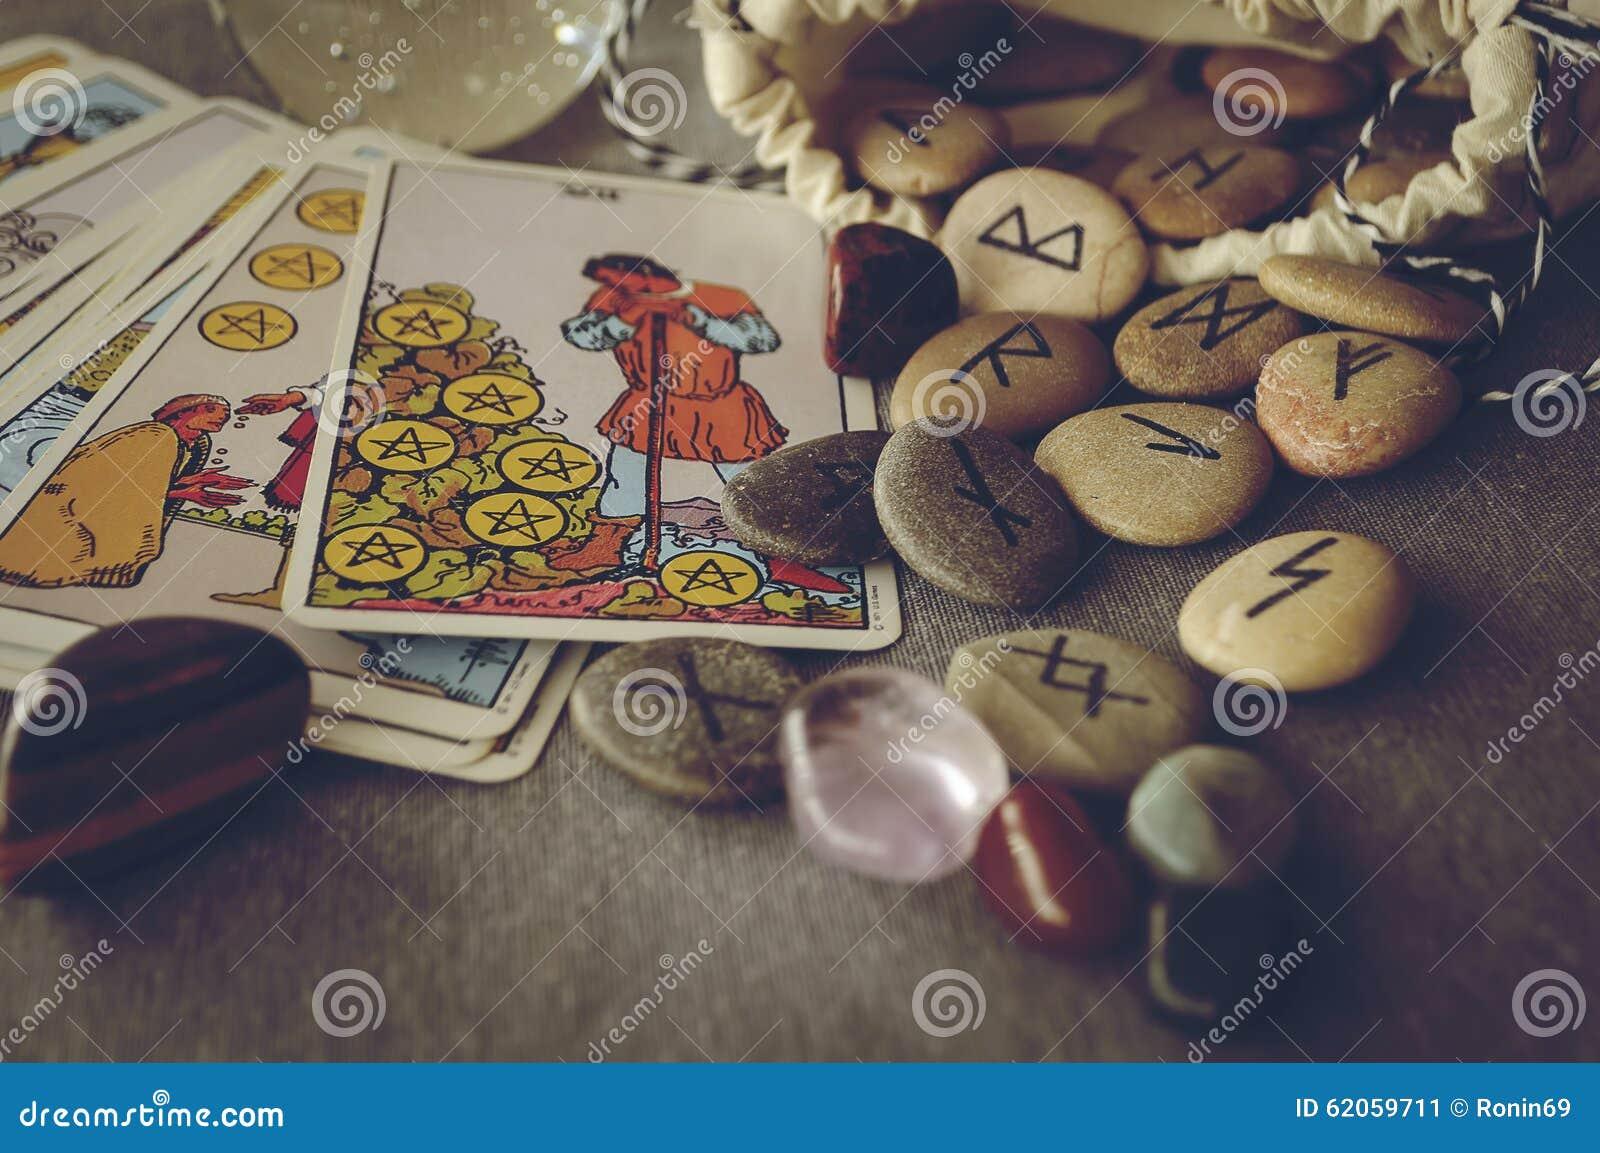 tarot et rune